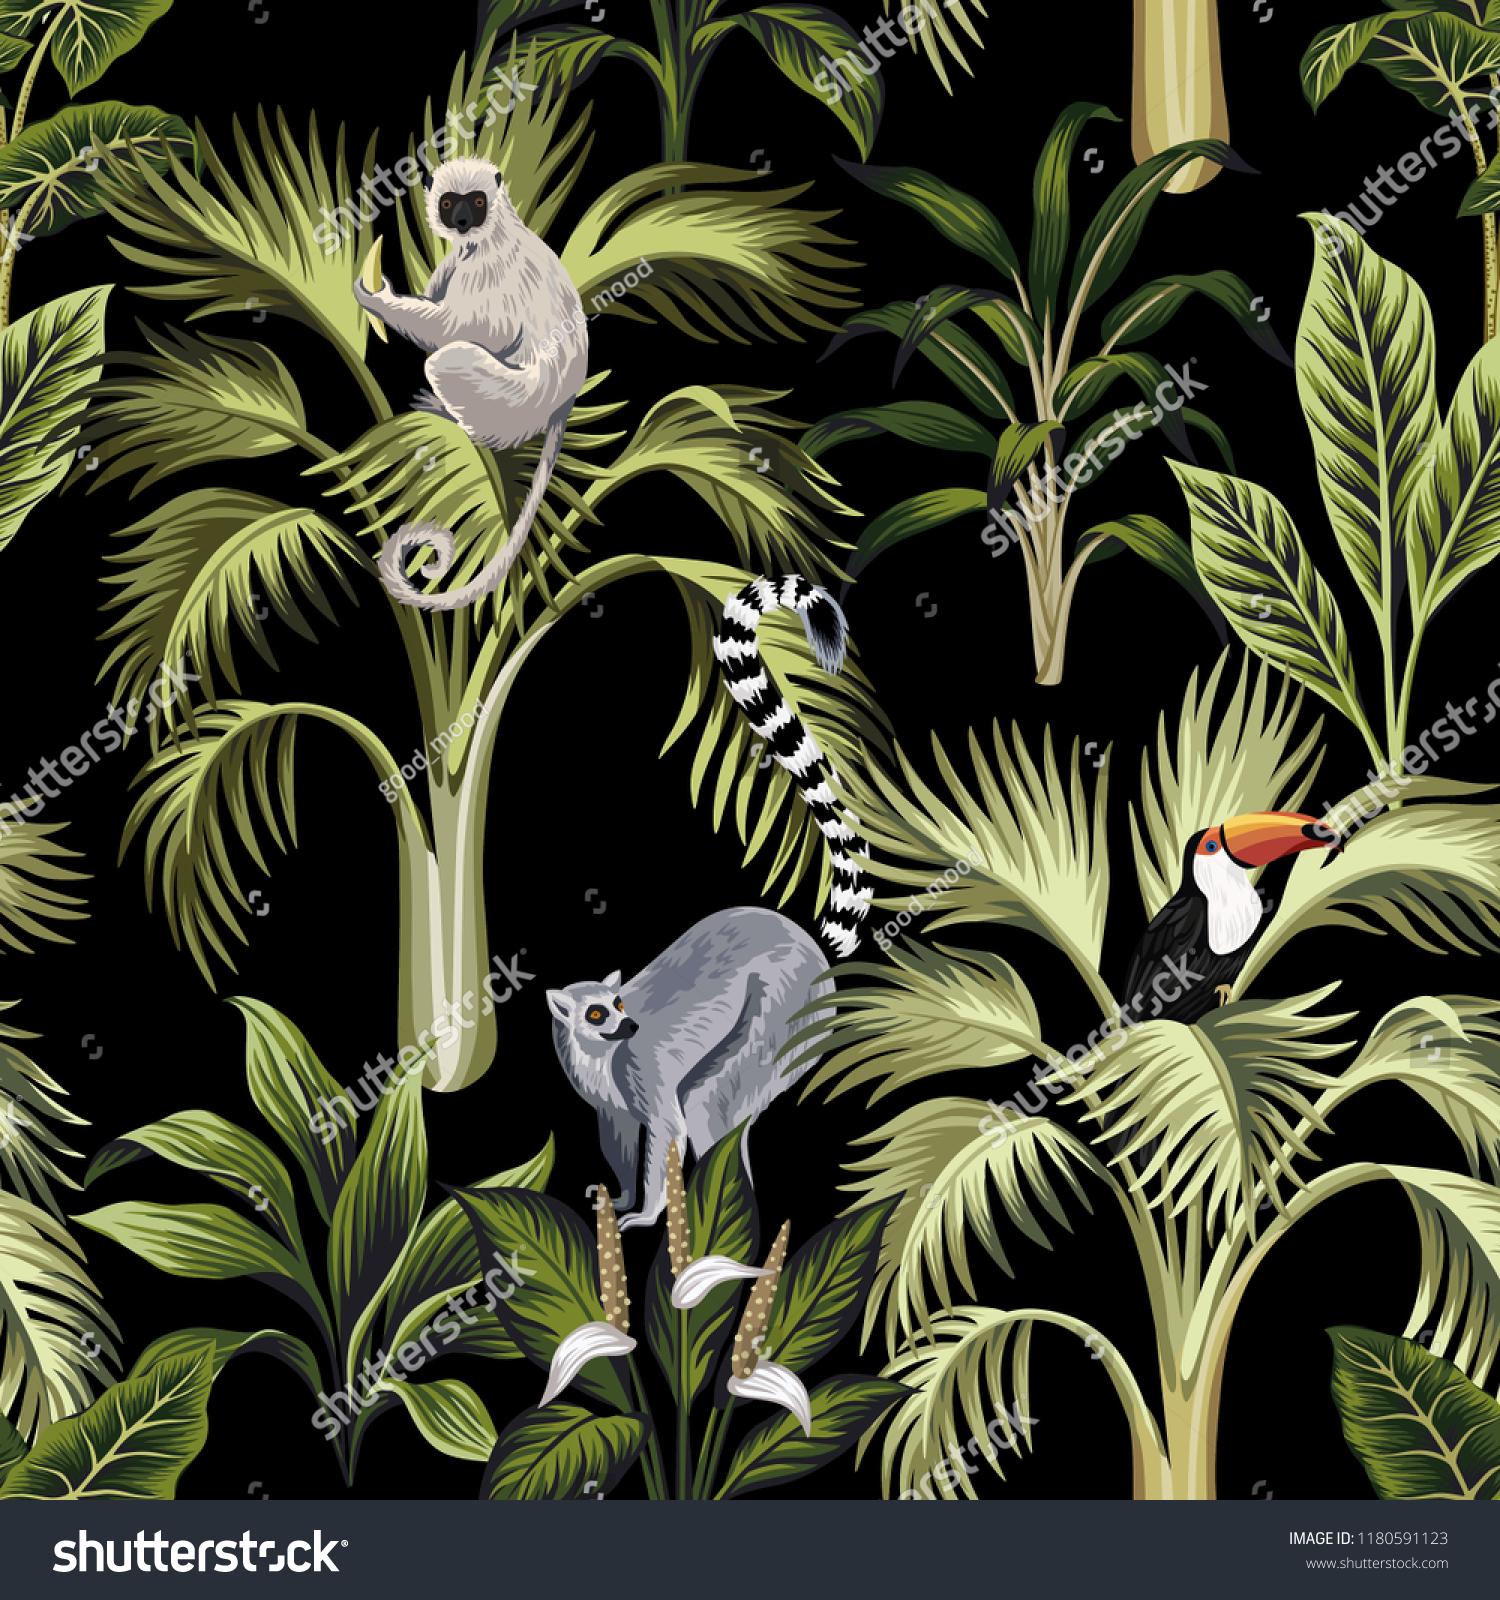 Tropical Vintage Palm Trees Plants Lemur Stock Vector Royalty Free